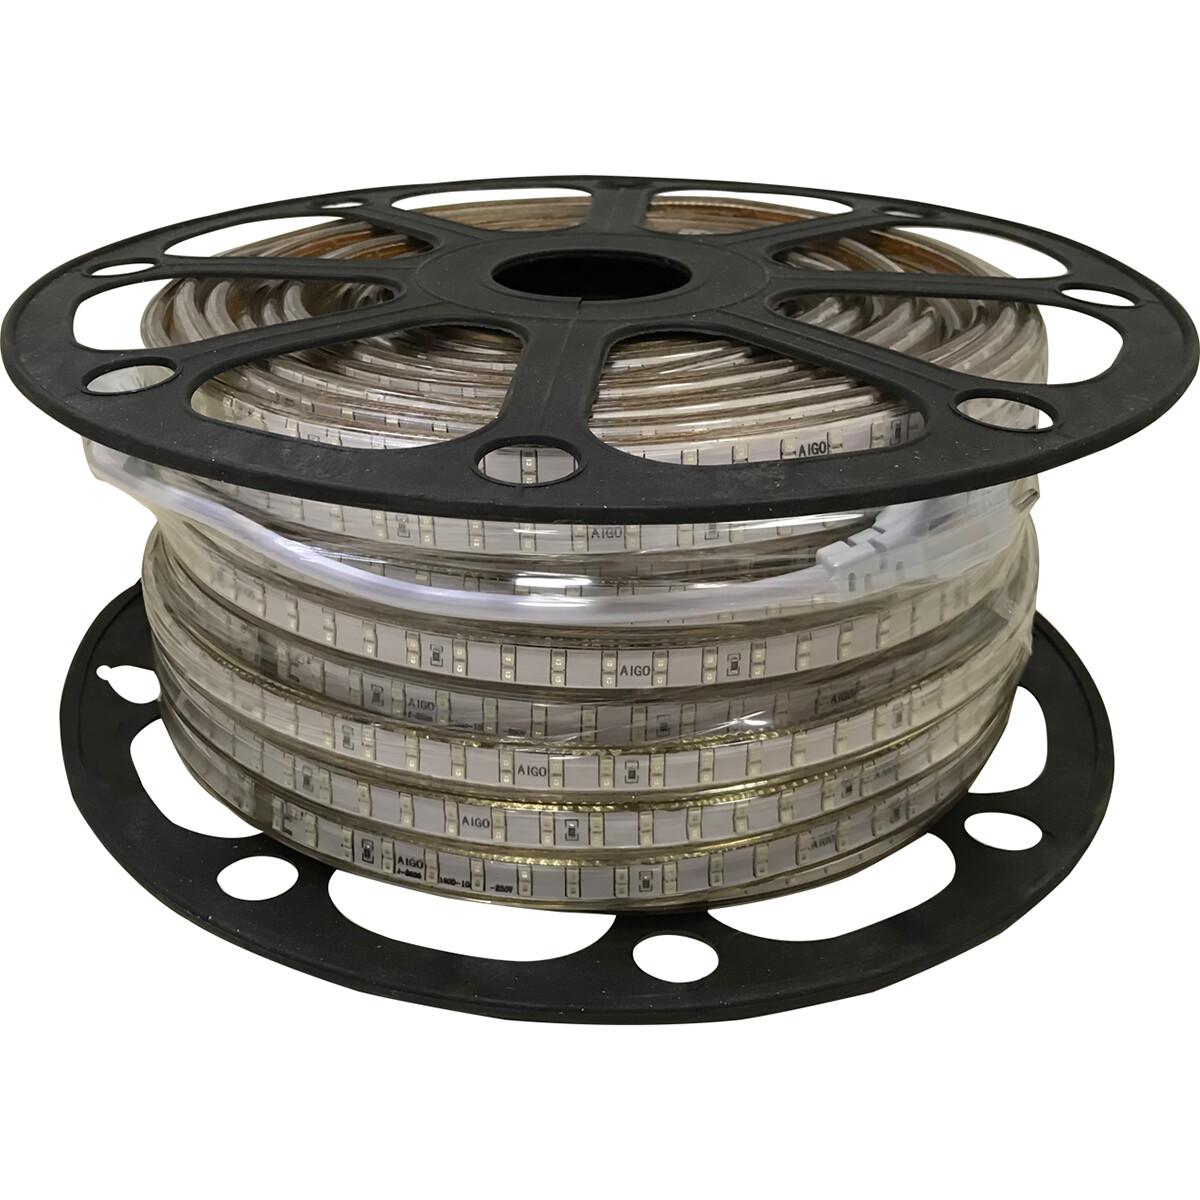 LED Strip - Aigi Strobi - 50 Meter - Dimbaar - IP65 Waterdicht - Rood - 2835 SMD 230V